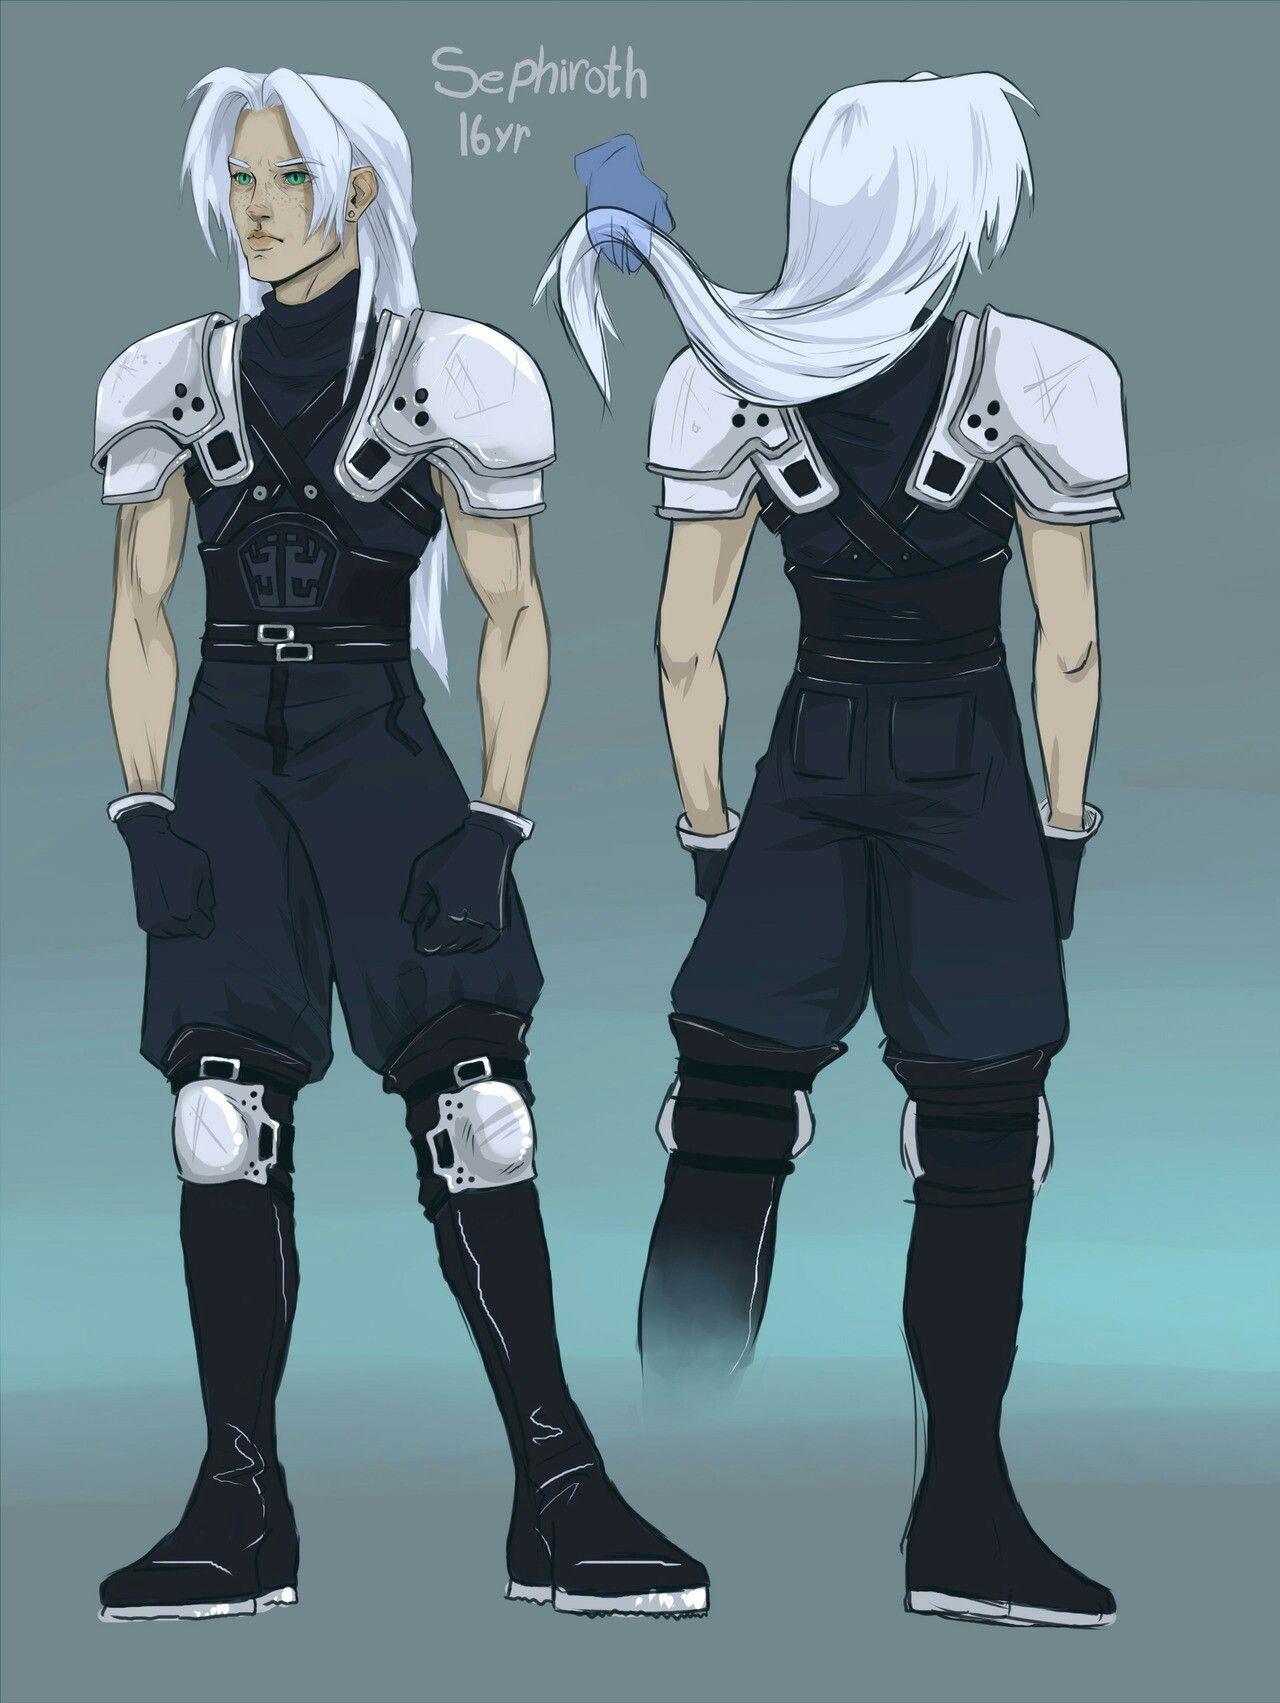 Young Sephiroth Final fantasy sephiroth, Final fantasy